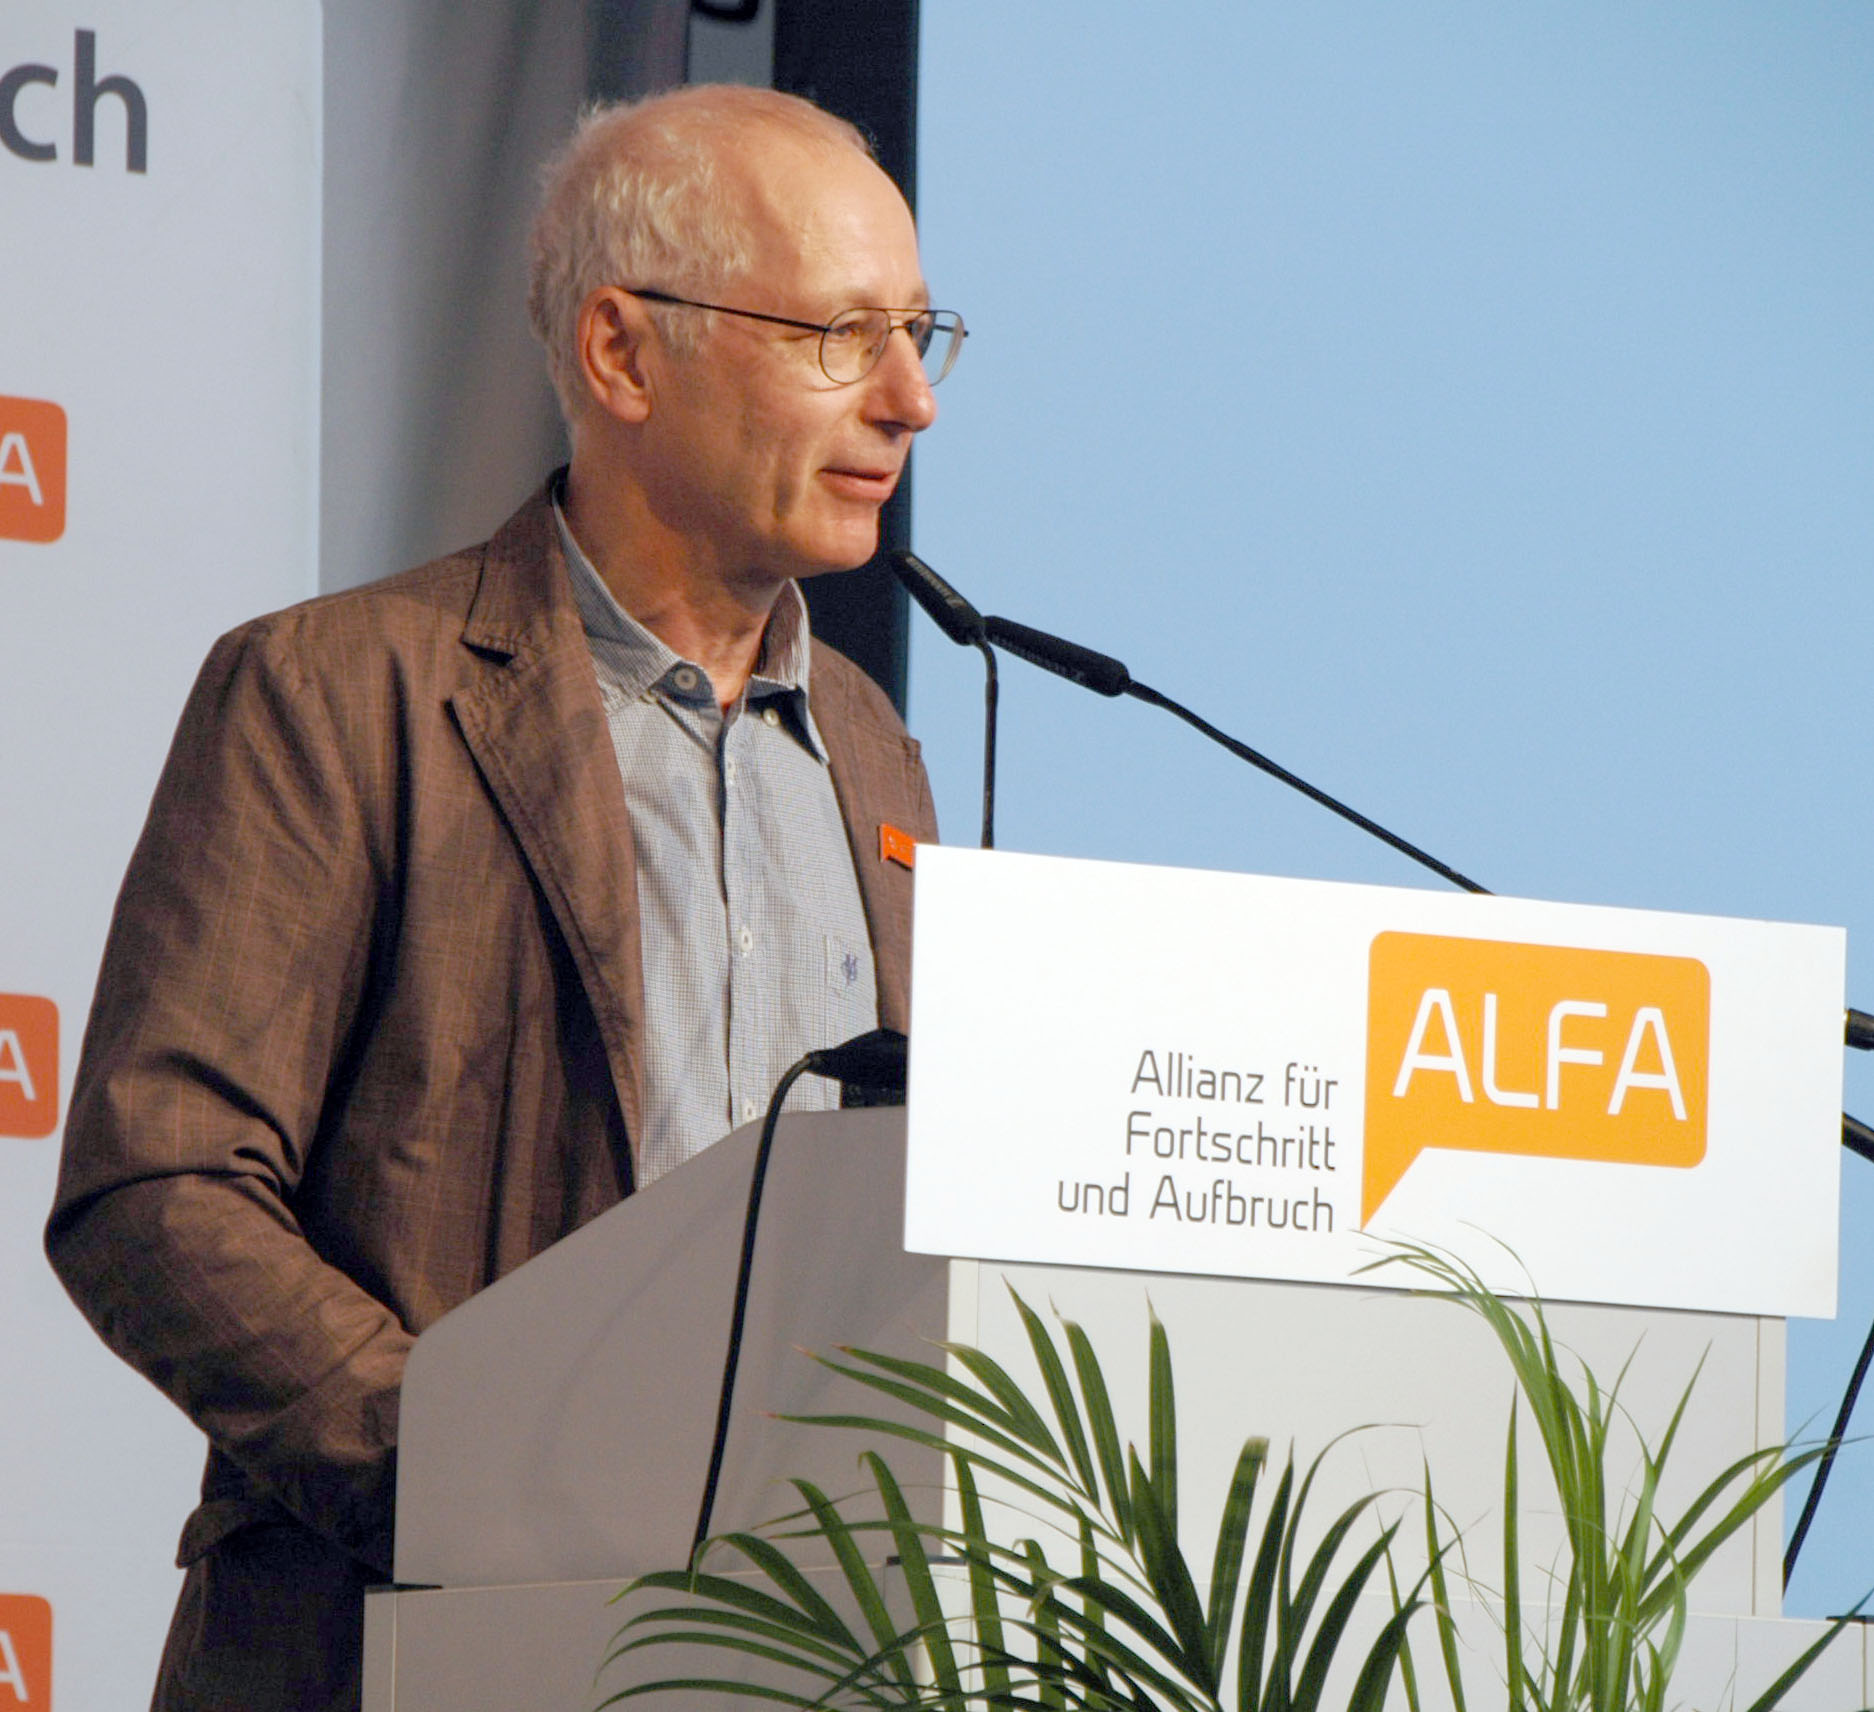 Ulrich van Suntum: ALFA Landesvorsitzender Nordrhein-Westfalen ALFA